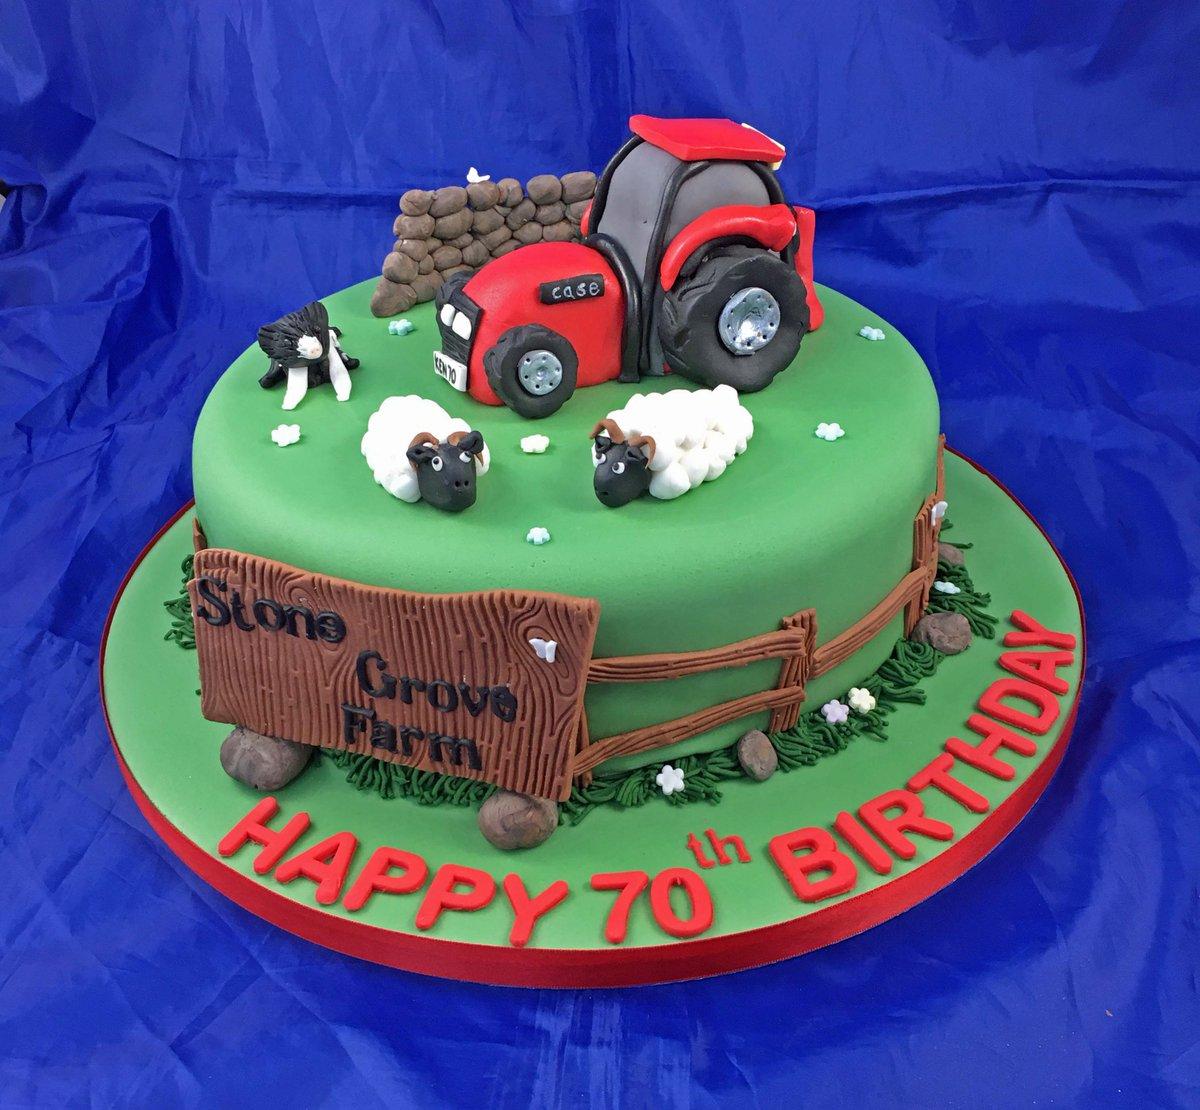 Nicola Young On Twitter Case Tractor Cake Tractorcake Birthdaycake YorkshireDales Casetractor Sheep Ingleton Homebakingbusiness